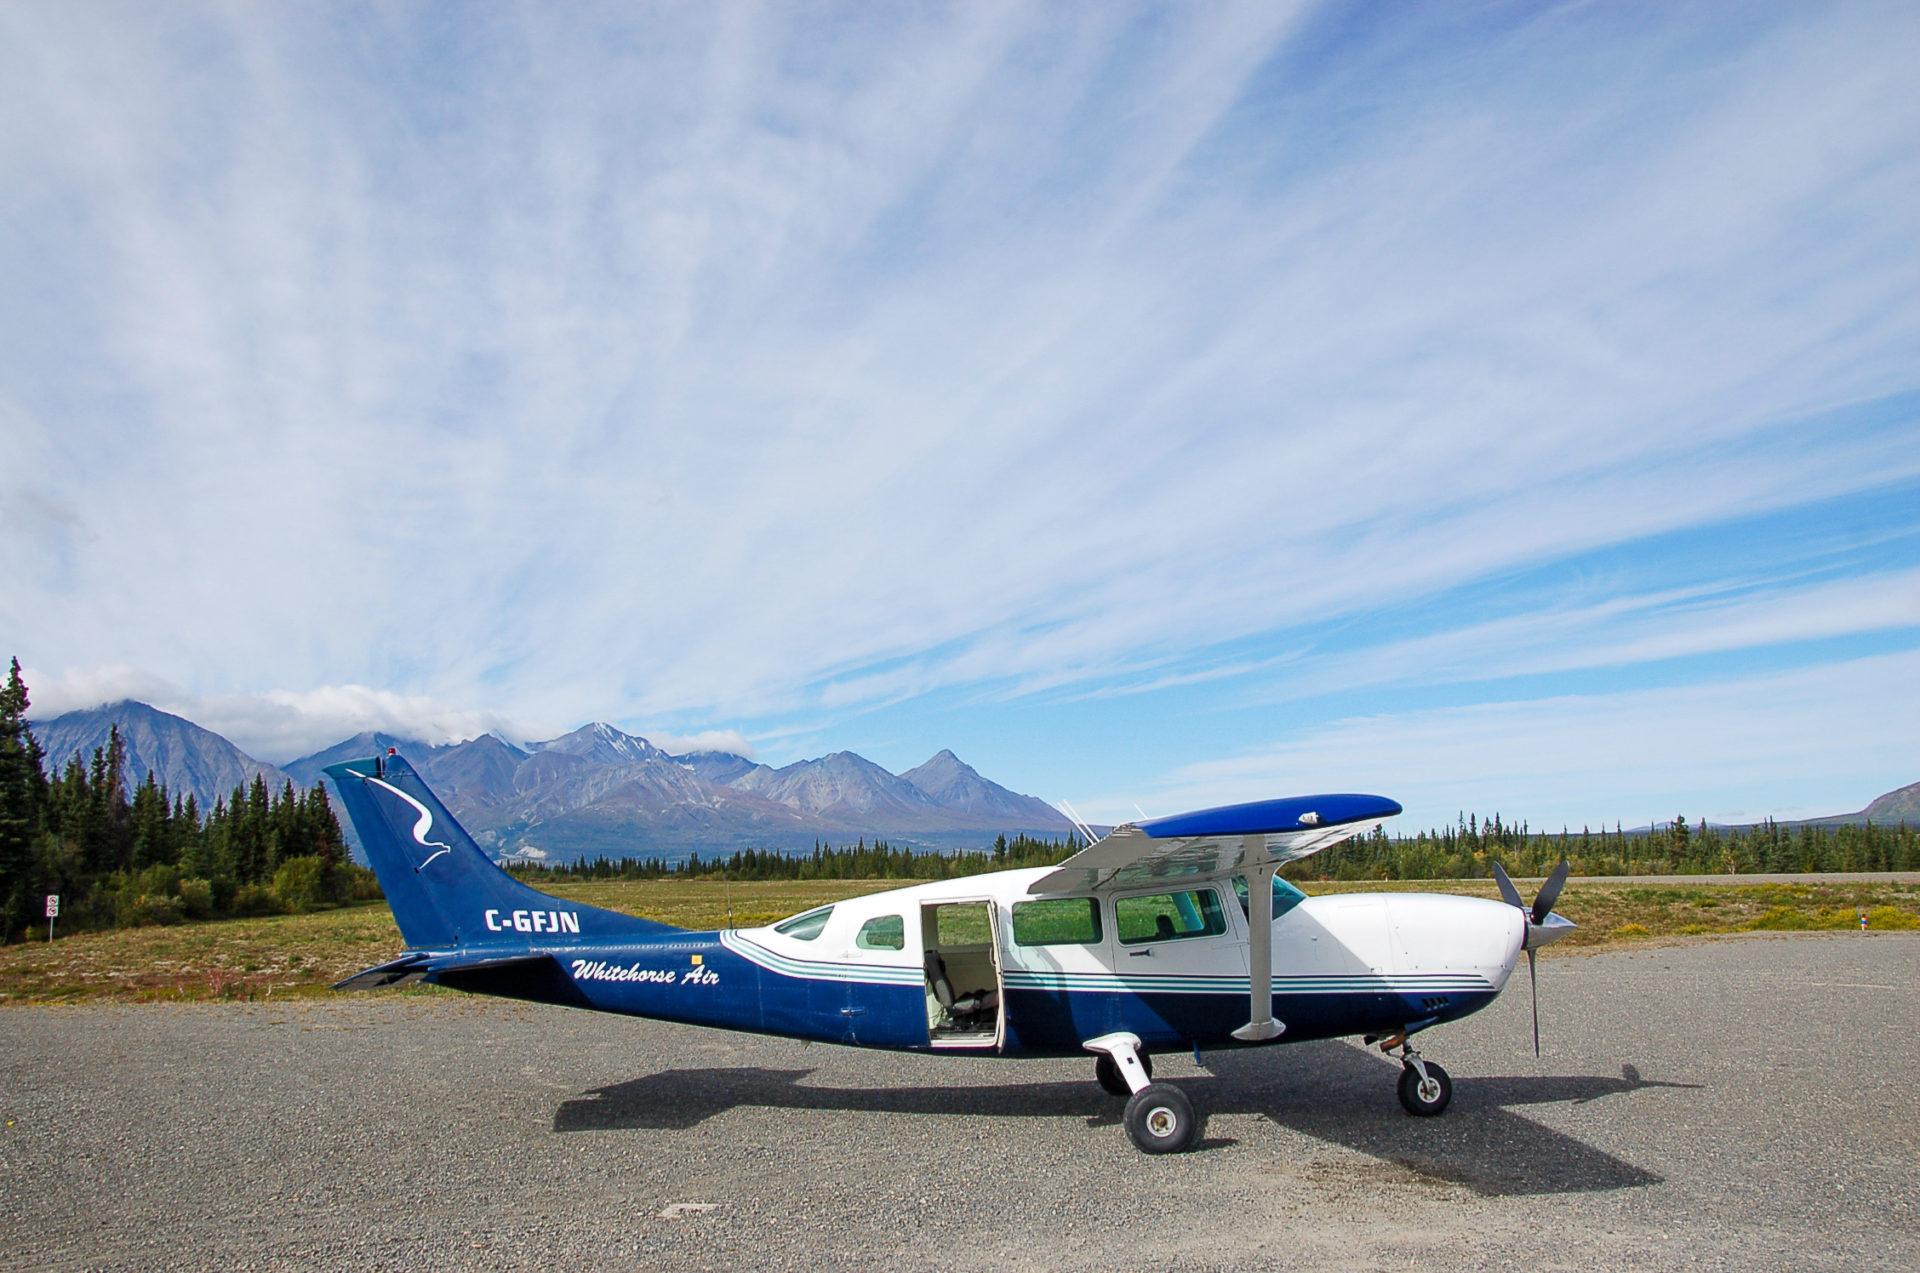 Sportflugzeug vor dem Rundflug über den Kluane National Park im Yukon